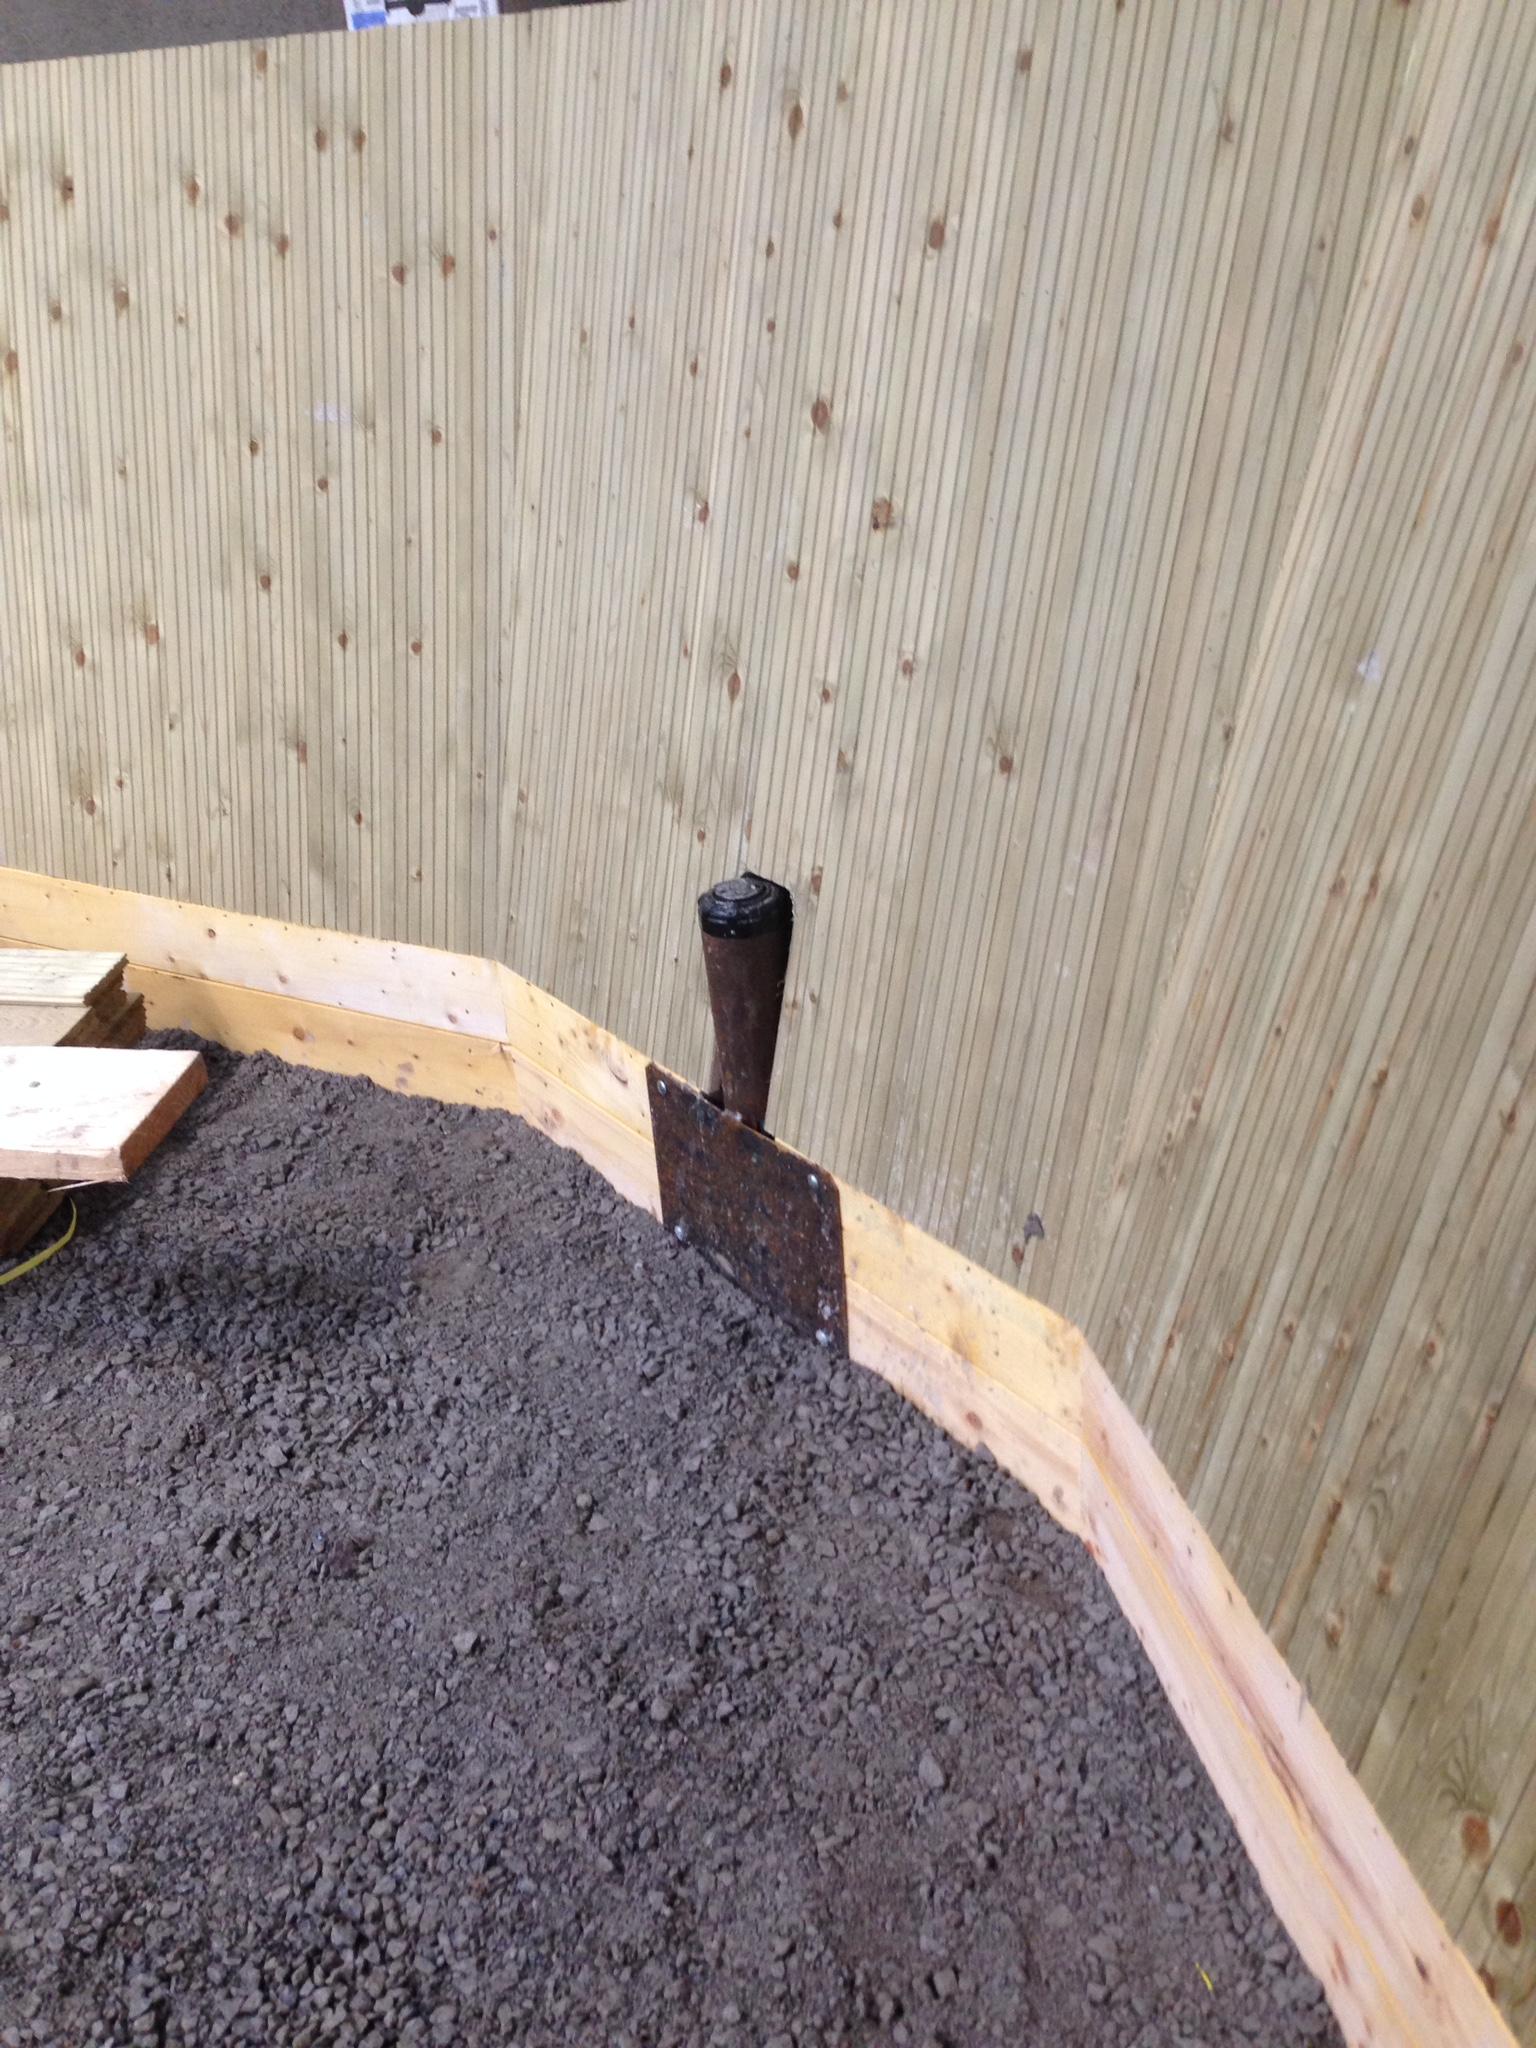 Irrigation head in corner